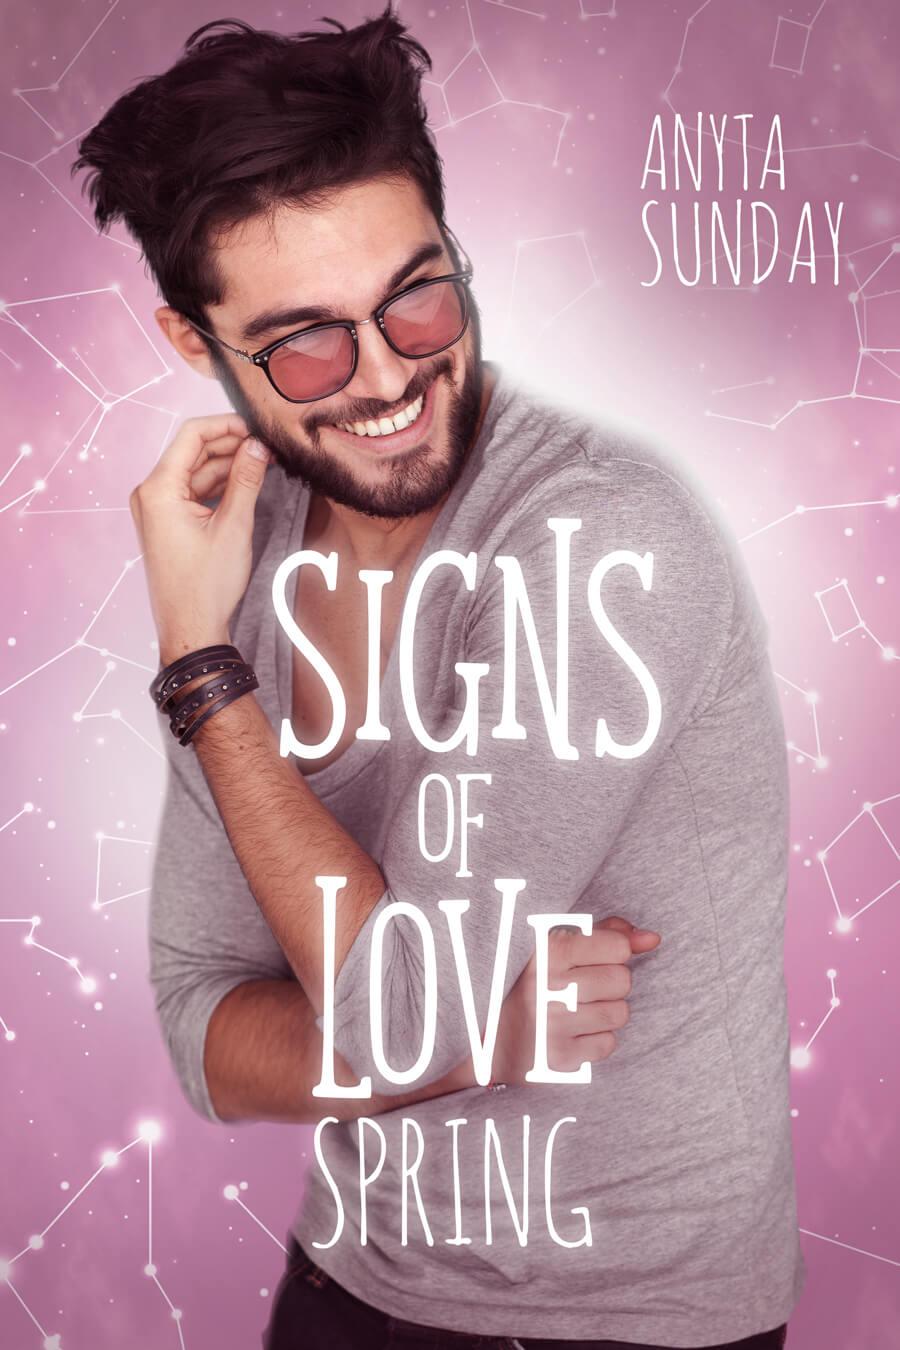 Signs of Love Spring Gay Romance Novella by Anyta Sunday